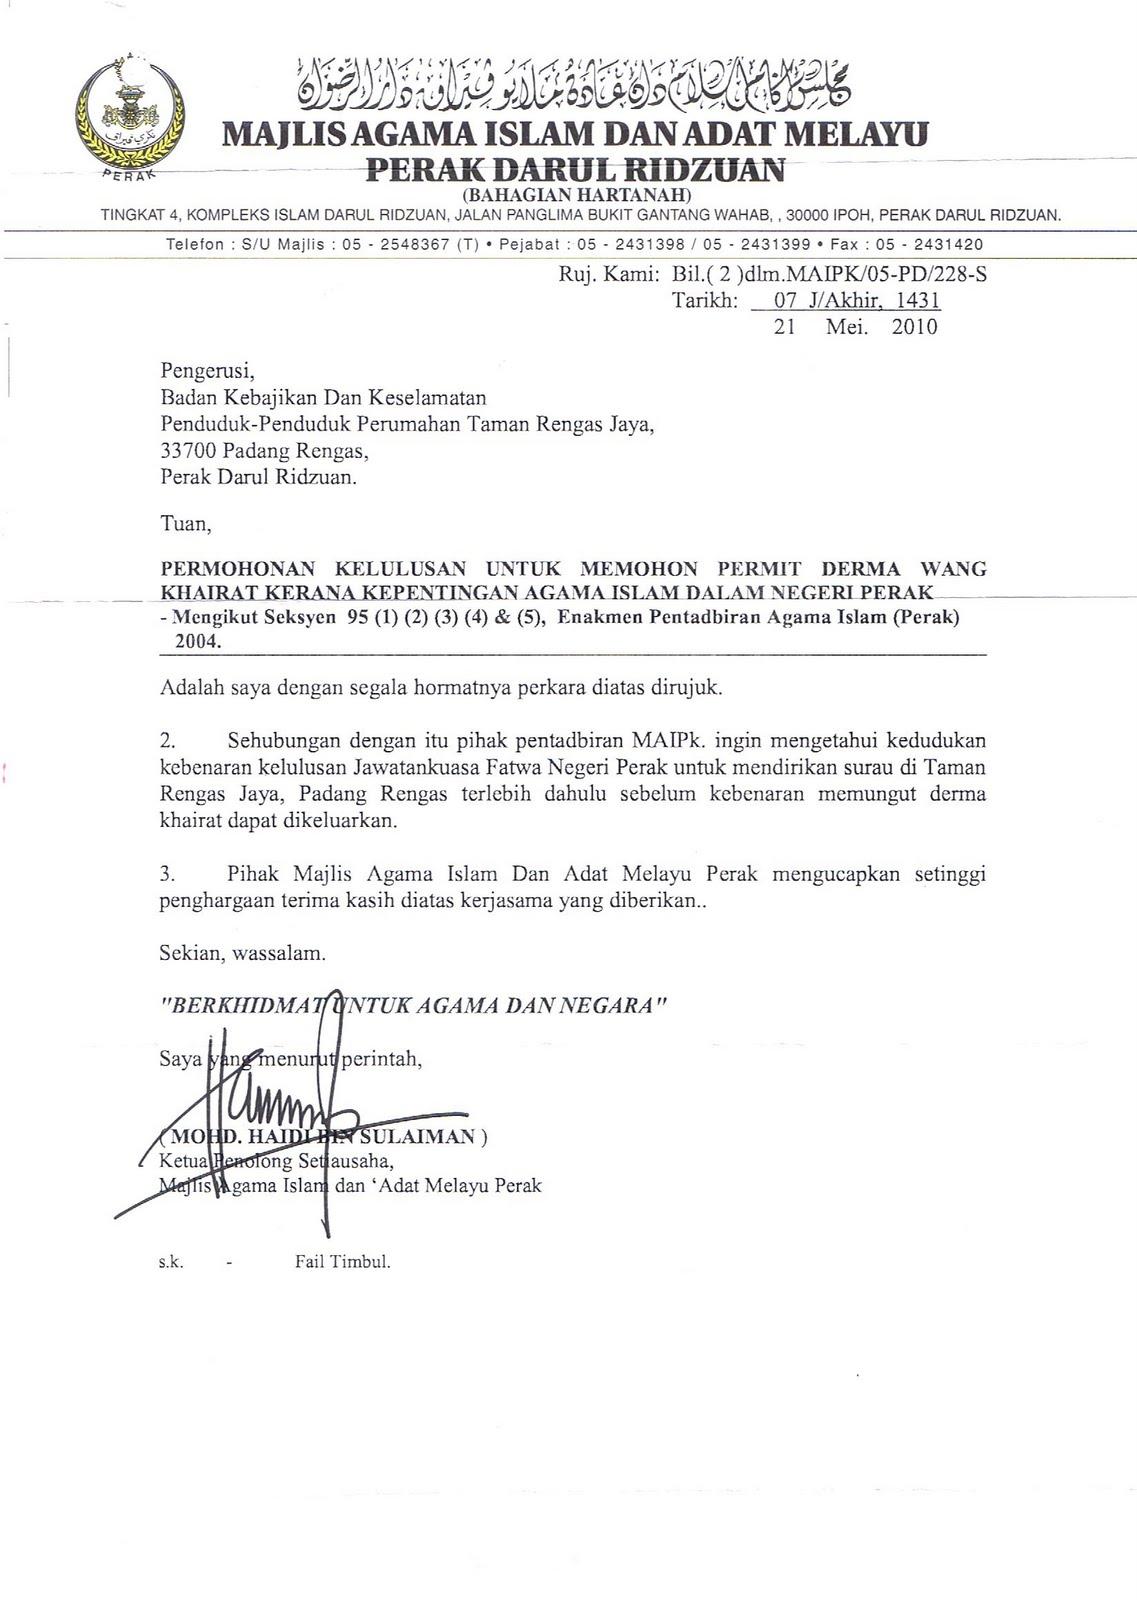 Contoh Surat Rasmi Permohonan Jalan Tar - Surat R